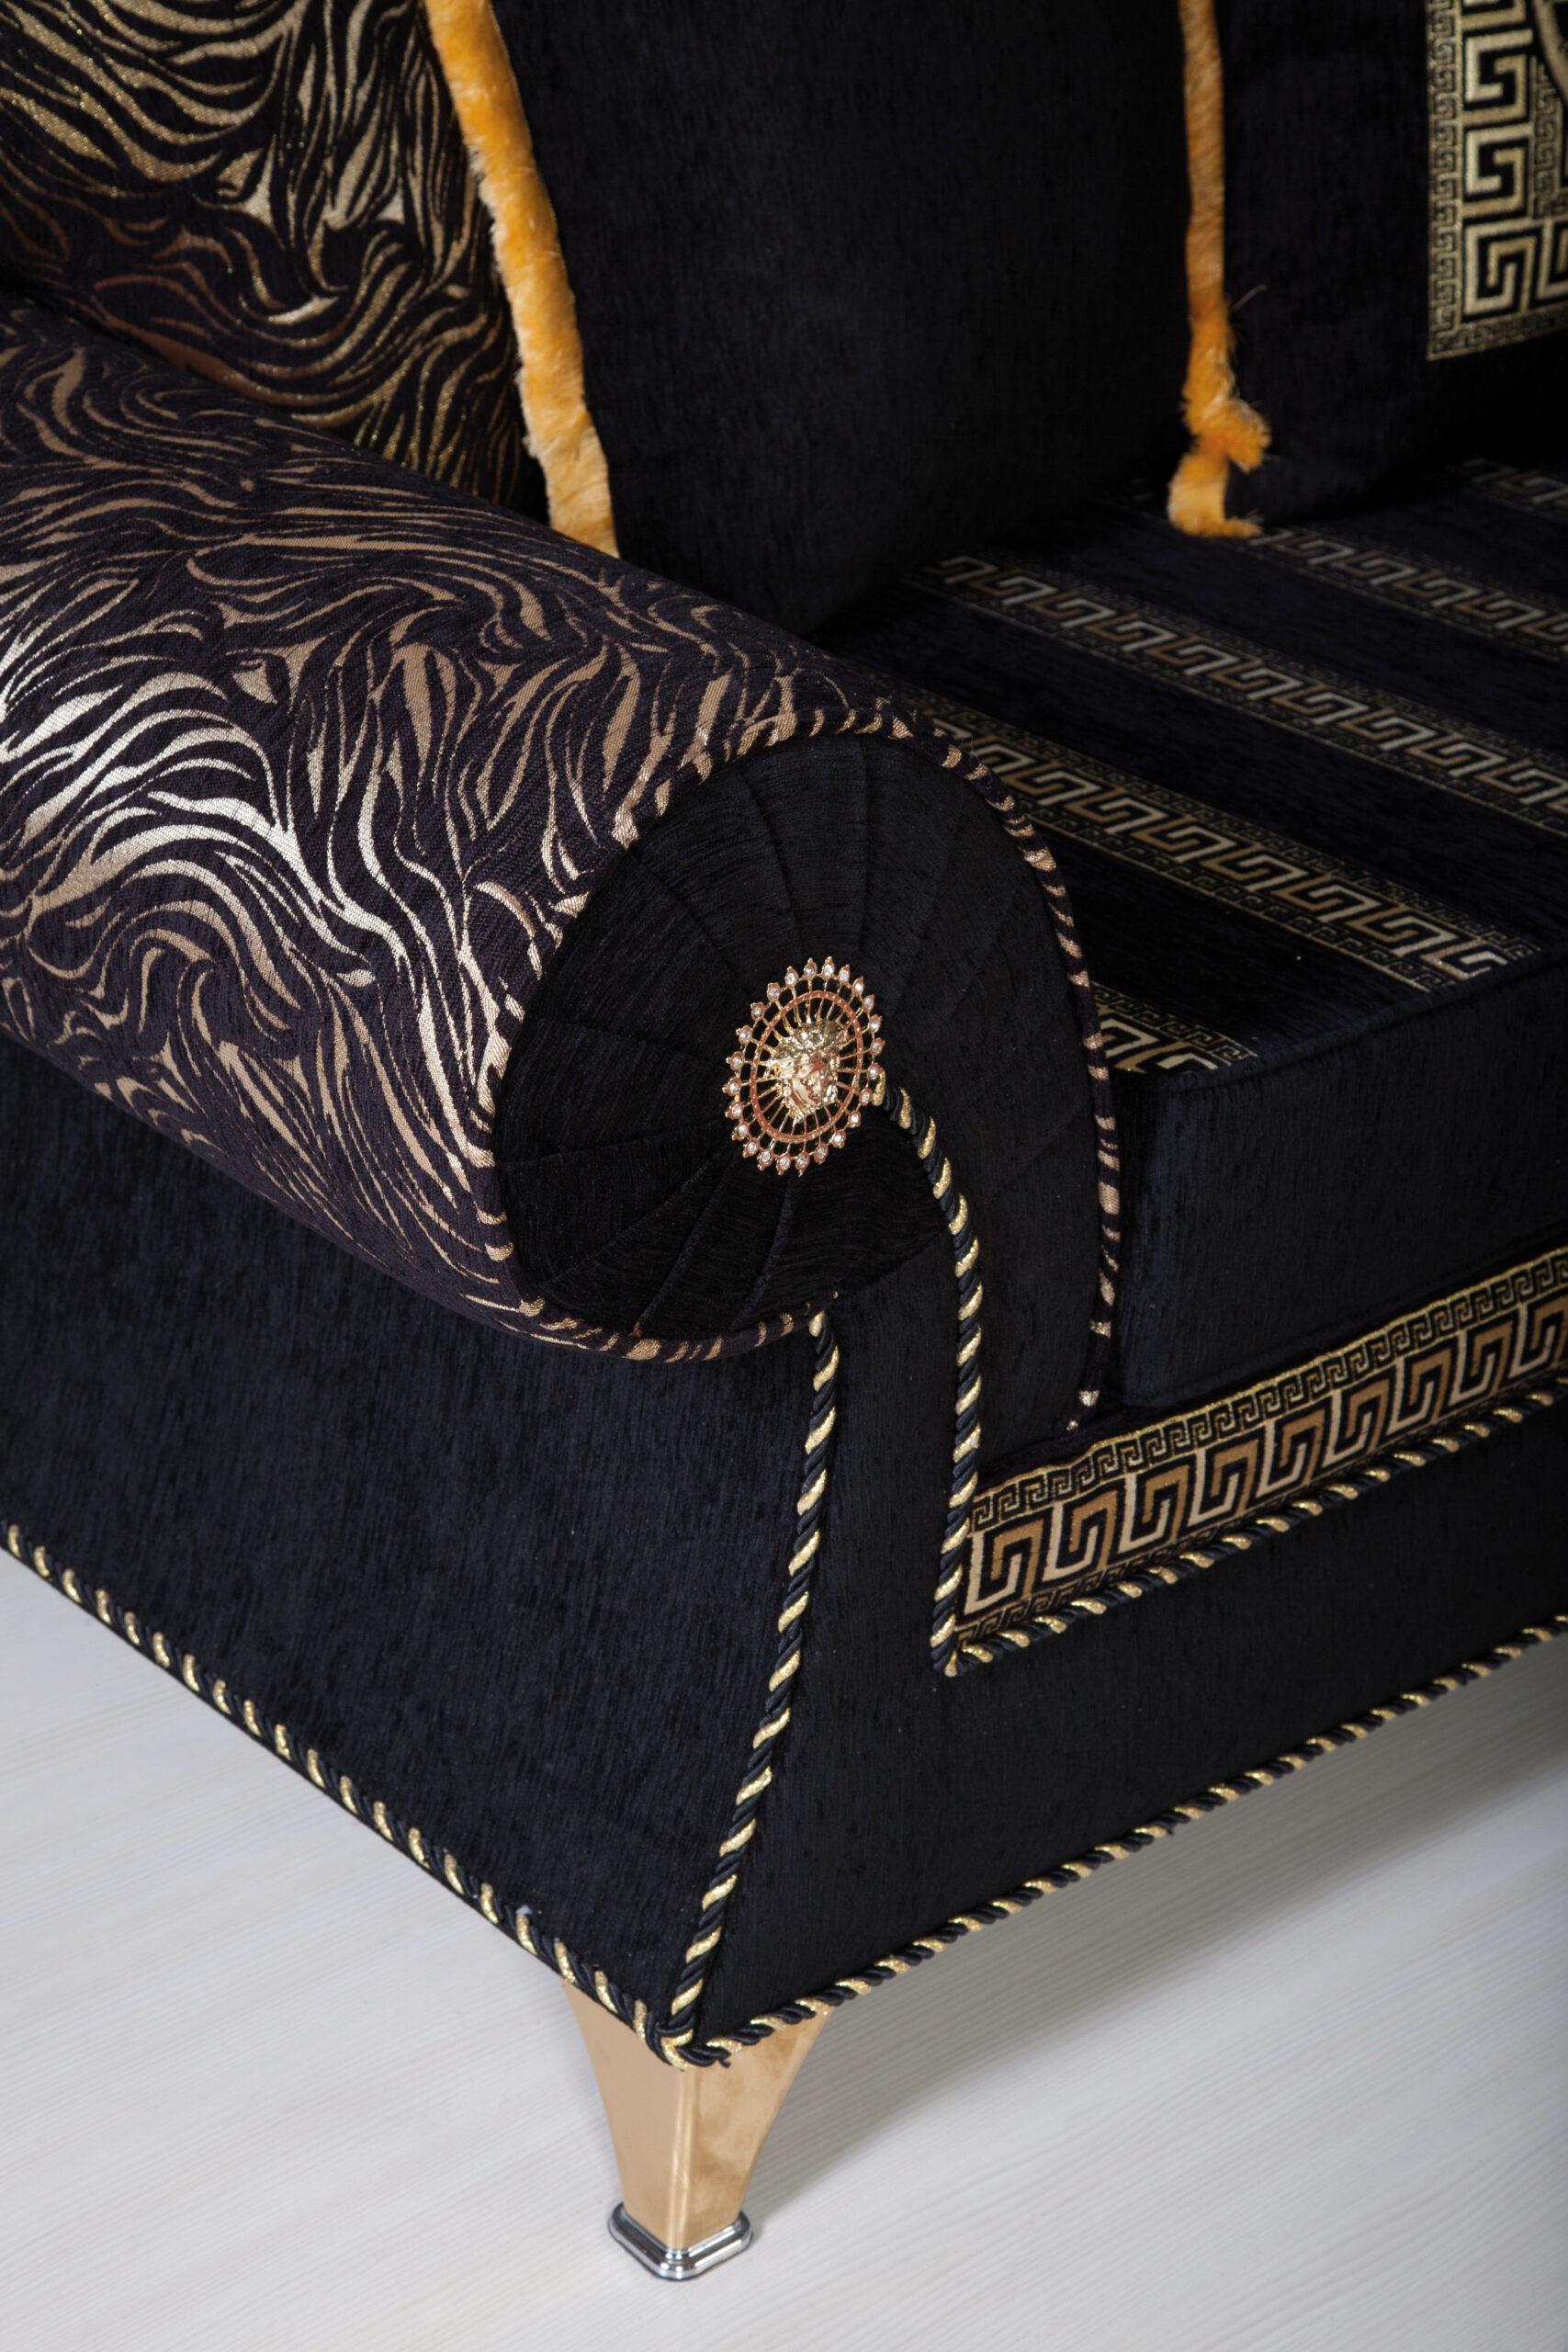 Full Size of Sofa Barock Stil Schwarz Gebraucht Baroque Style Kaufen Set Blau Grau Barockstil Gold Braun Silber Sofas Garnitur Baroni Franz Fertig Mit Abnehmbaren Bezug Sofa Sofa Barock